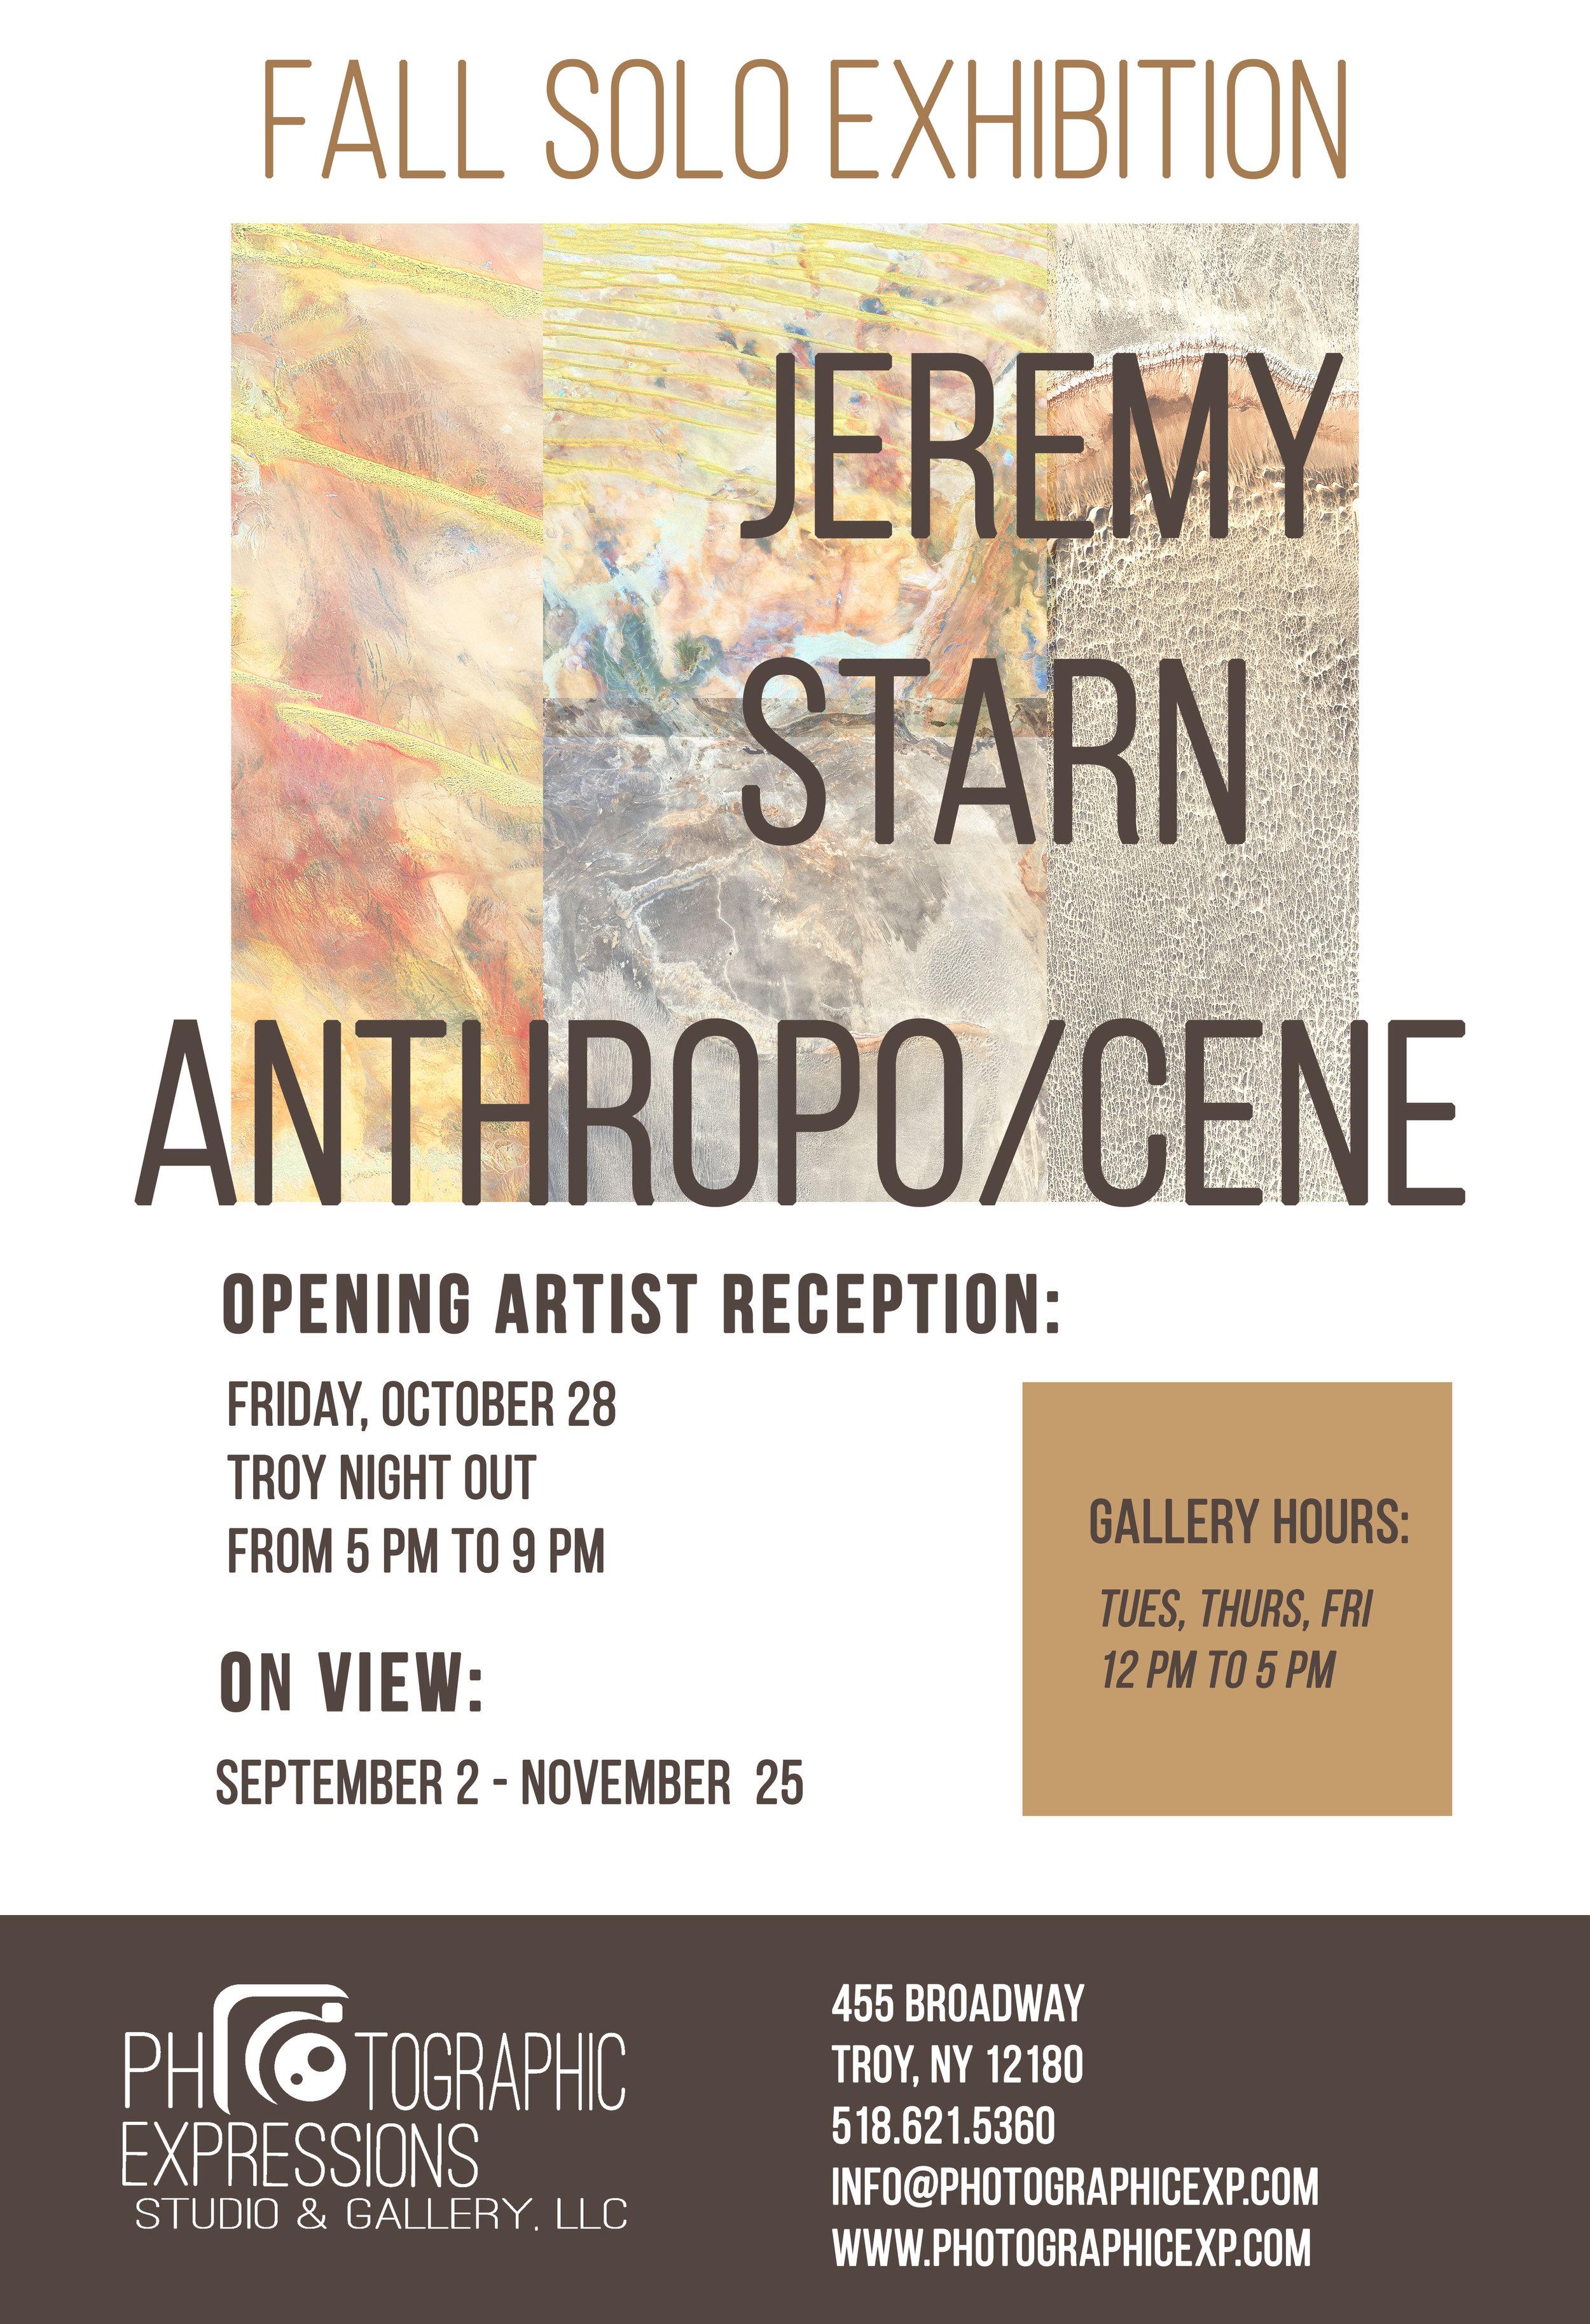 FALL SOLO EXHIBITION: Jeremy Starn, ANTHROPO/CENE